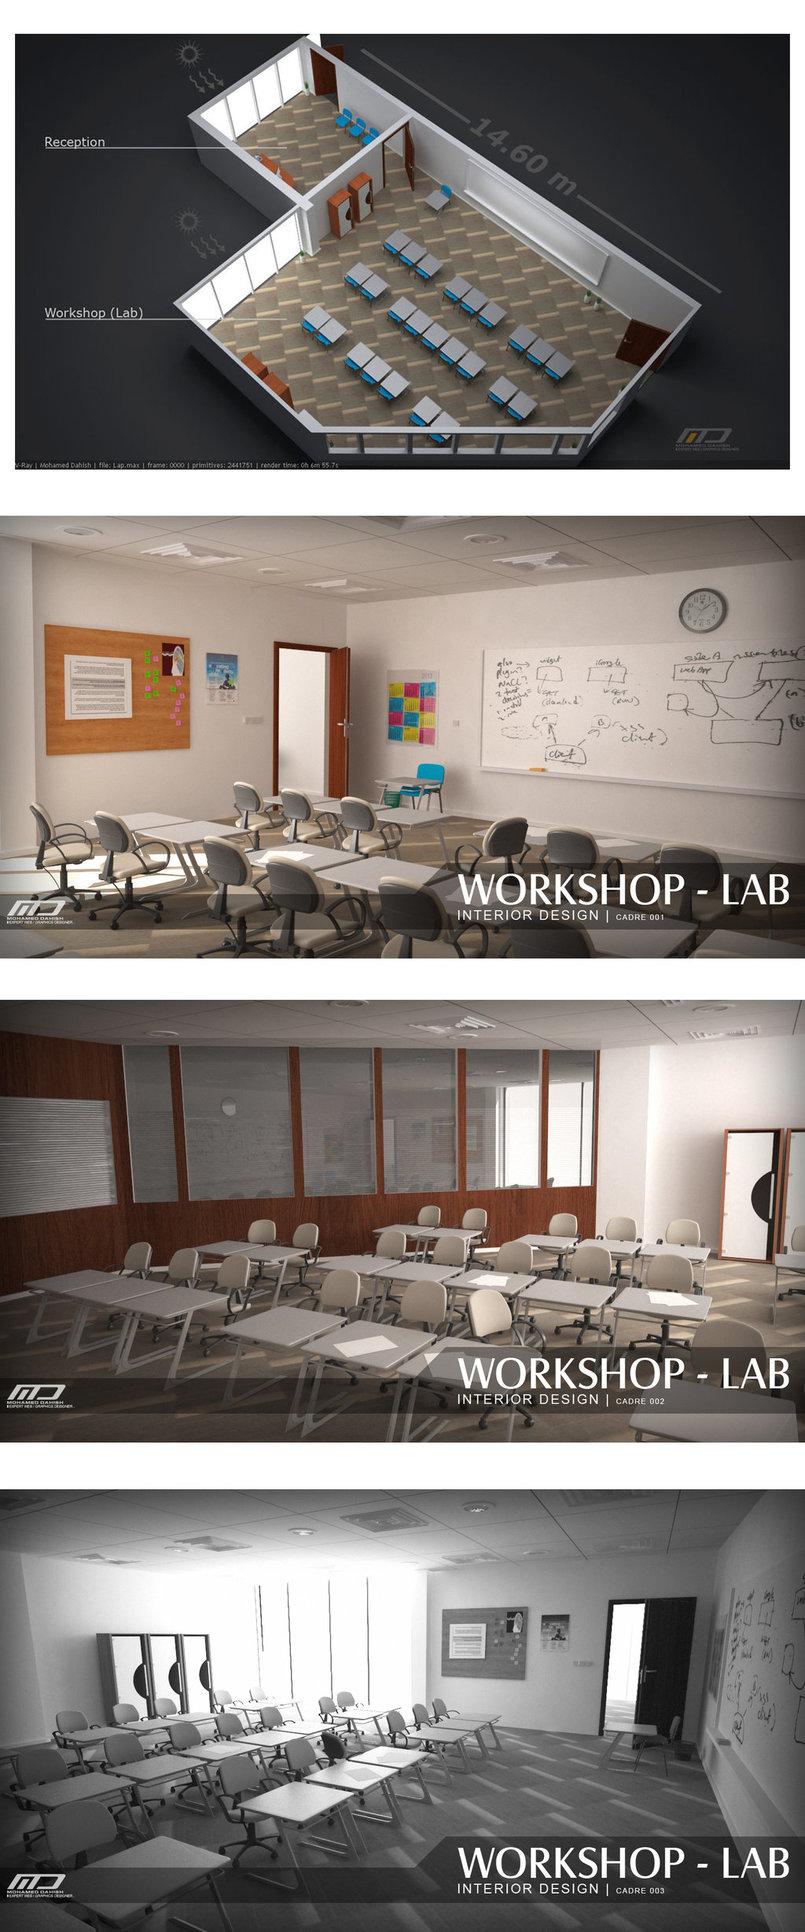 Workshop Lab - Interior Design